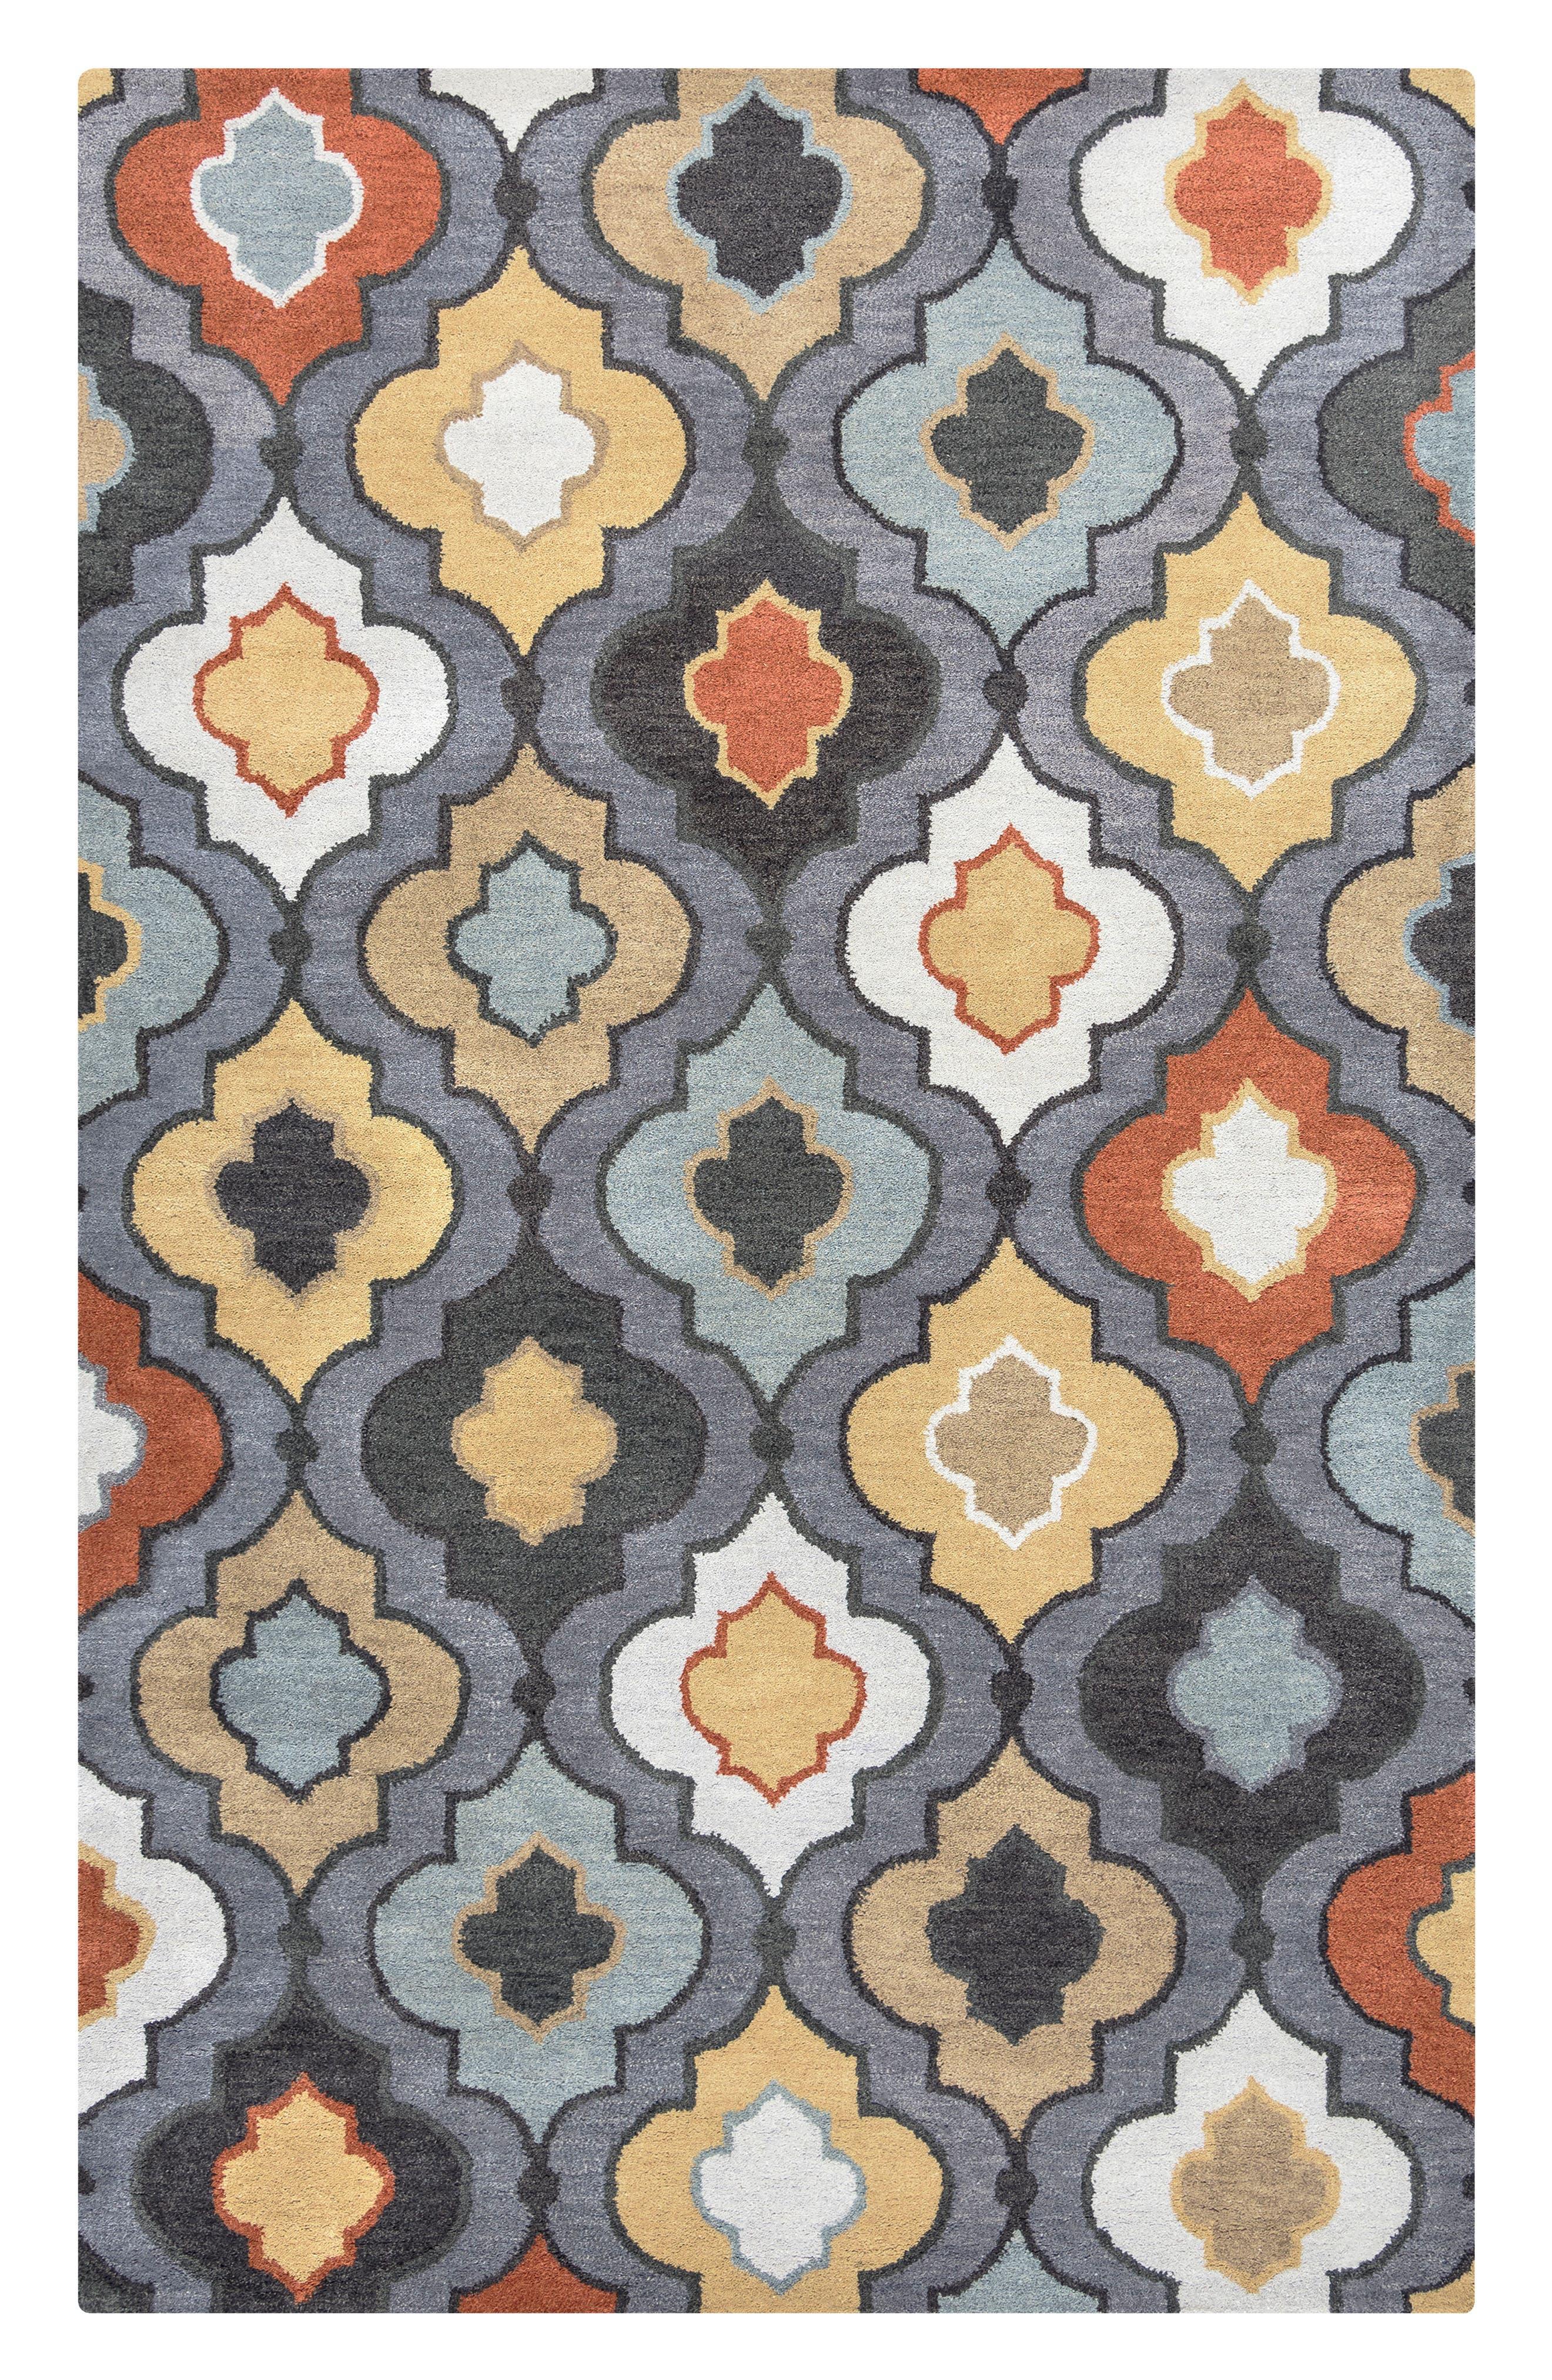 'Quatrefoil' Hand Tufted Wool Area Rug,                         Main,                         color, 030